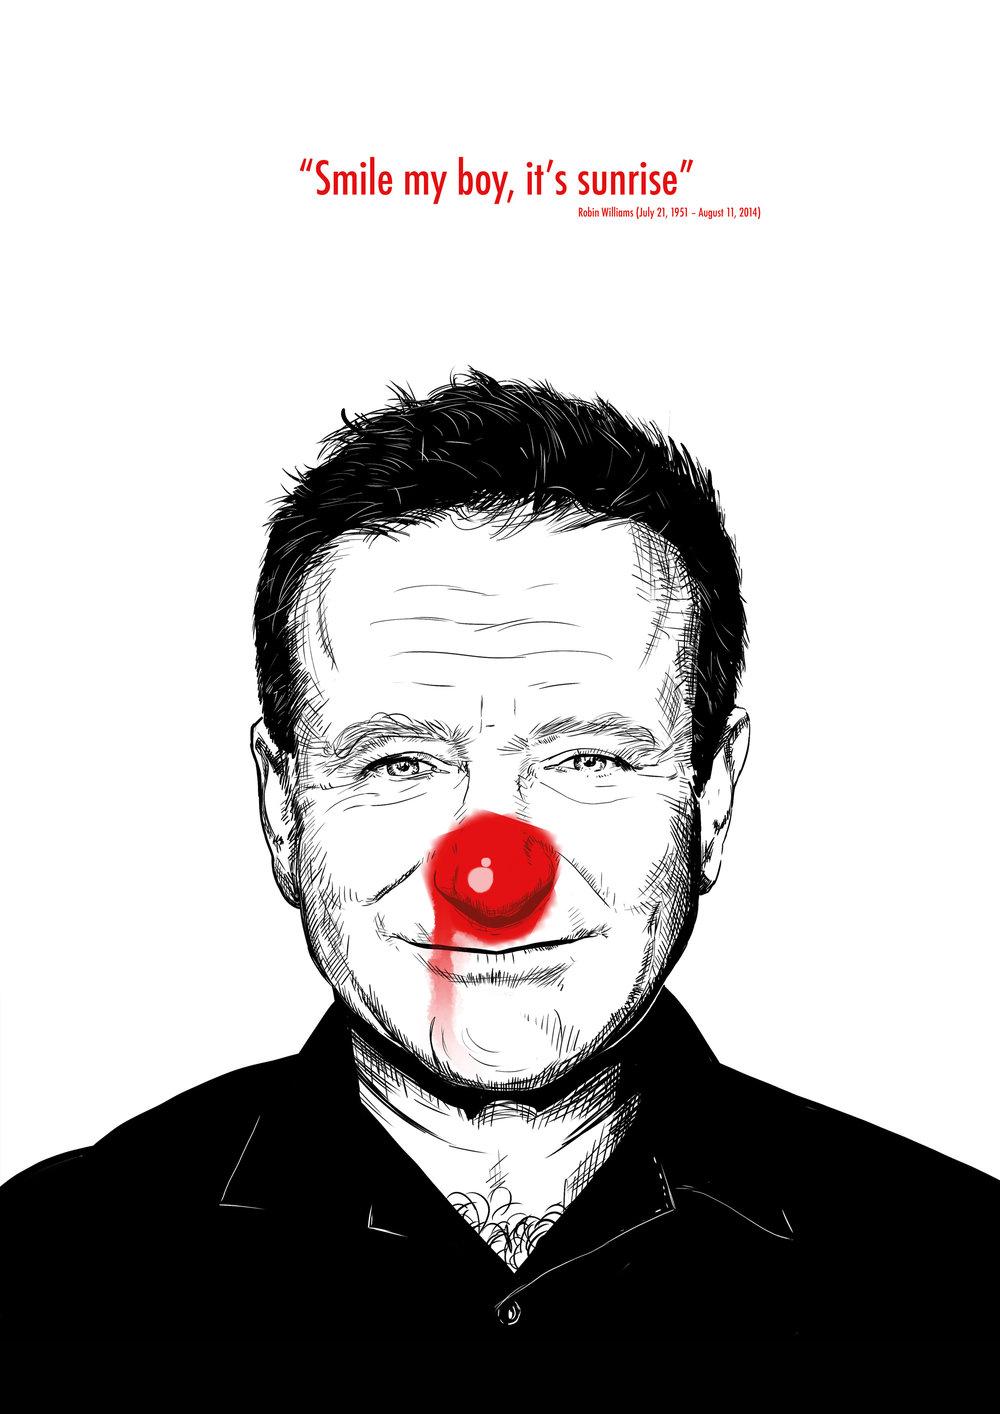 Robin Williams - Smile my boy, it's sunrise